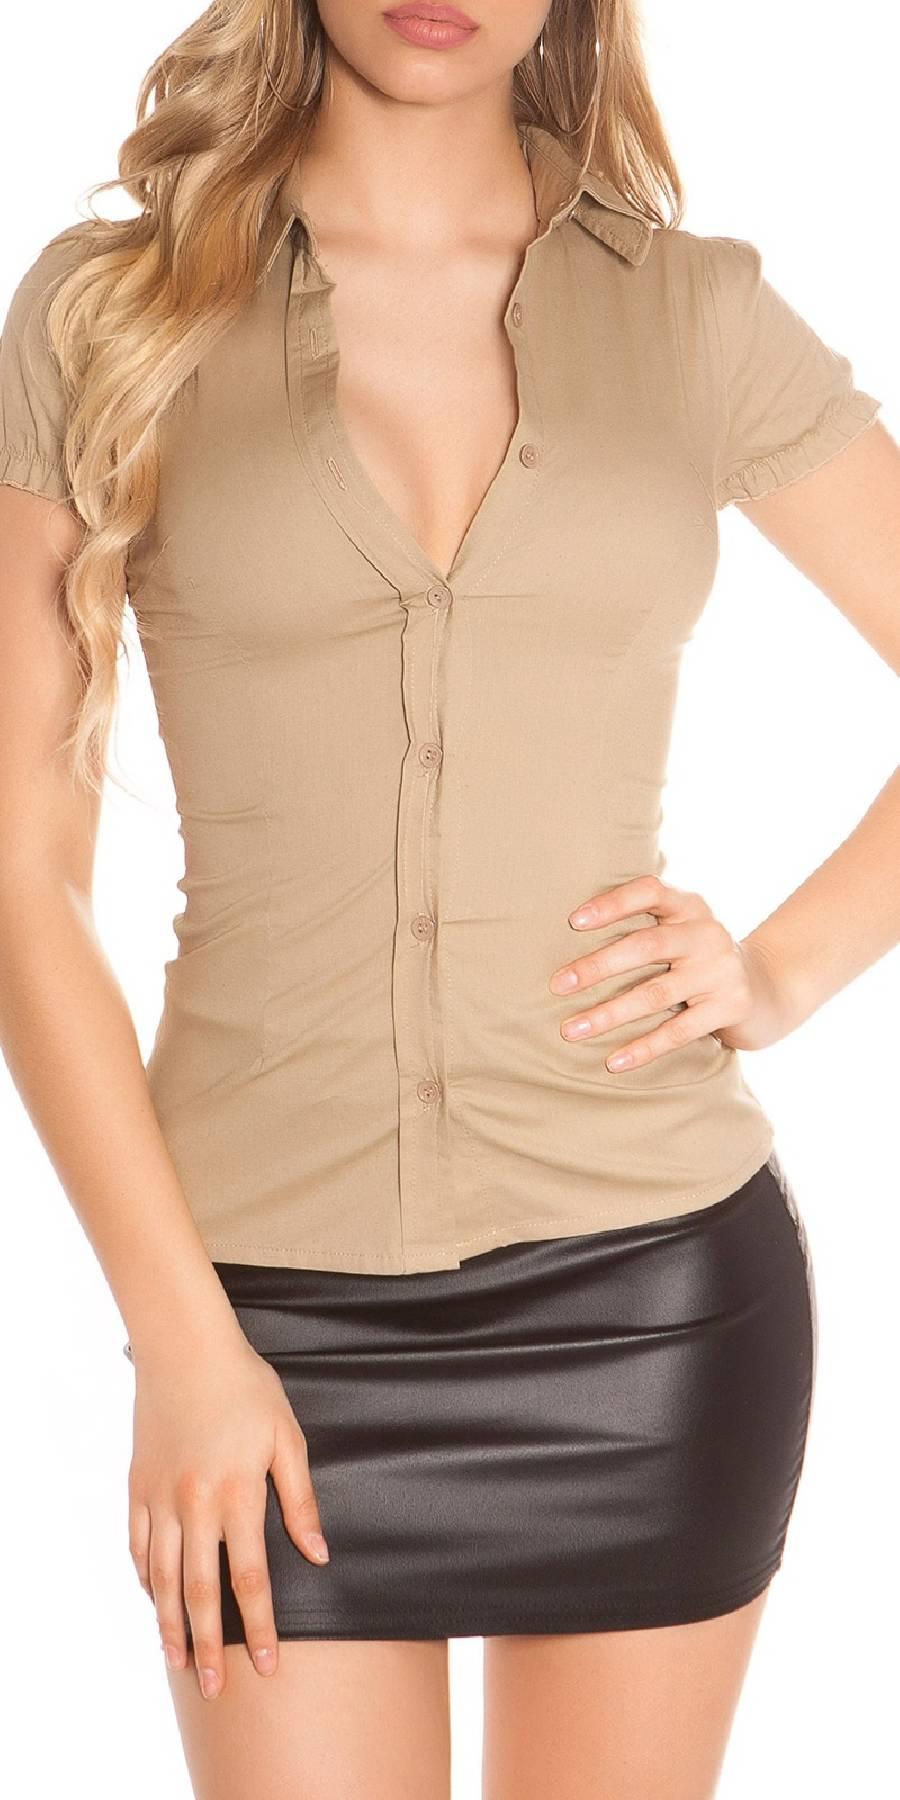 blazer veste nouvelle collection tendance fashion. Black Bedroom Furniture Sets. Home Design Ideas